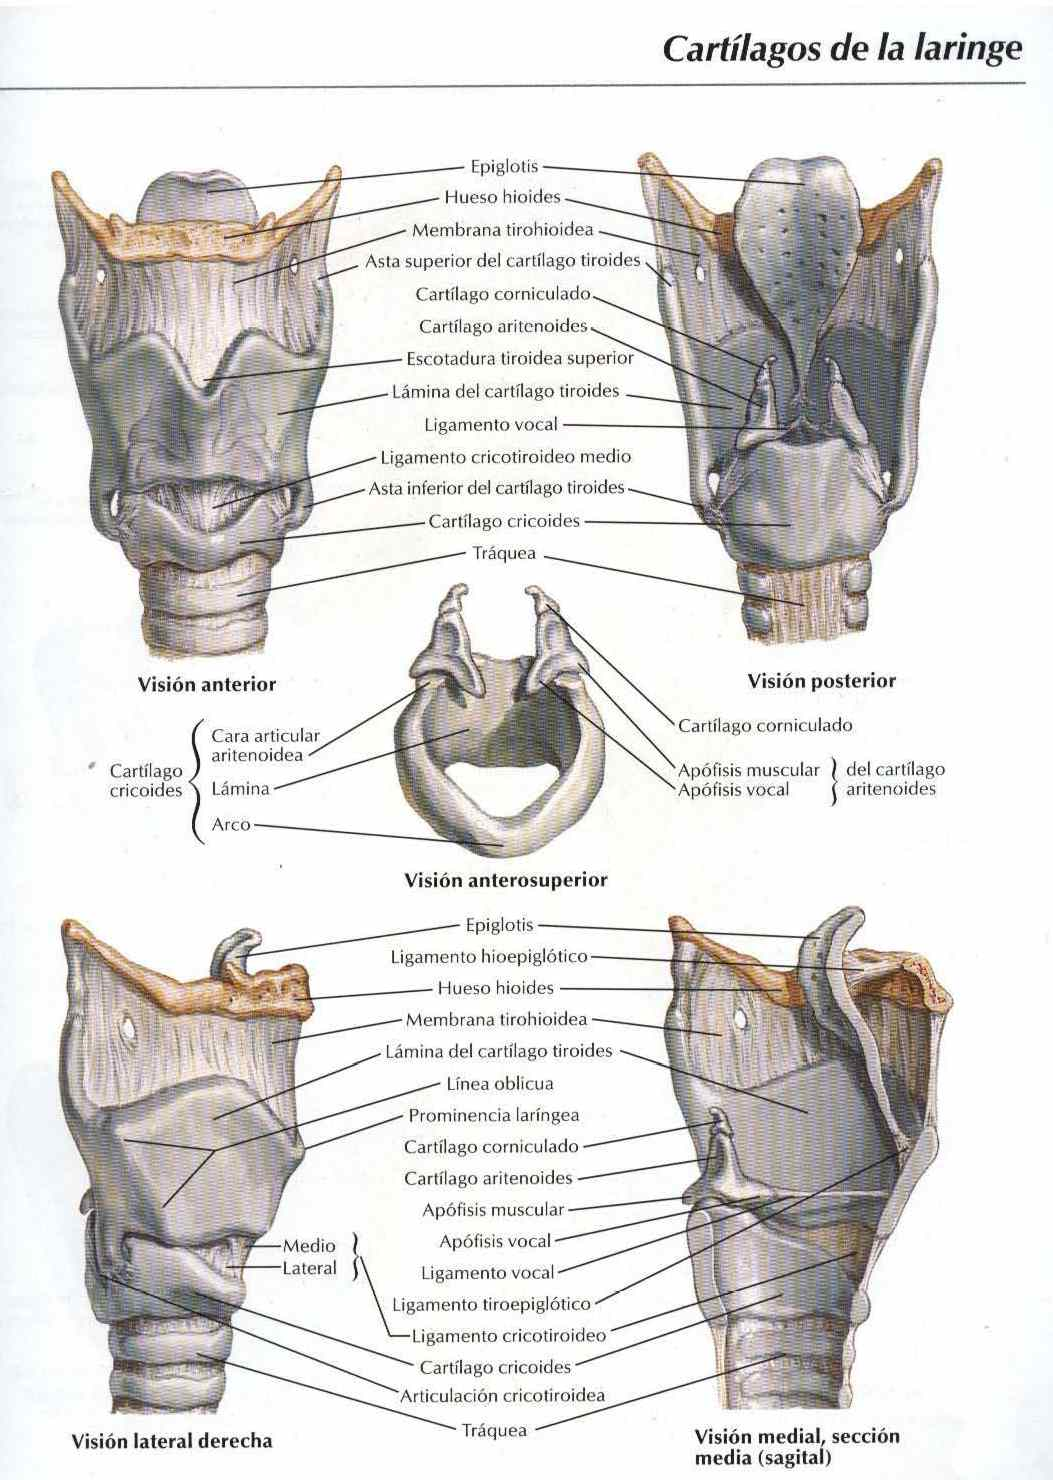 Atlas, anatomía: Cartílago de la laringe - Salud, vida sana, la ...